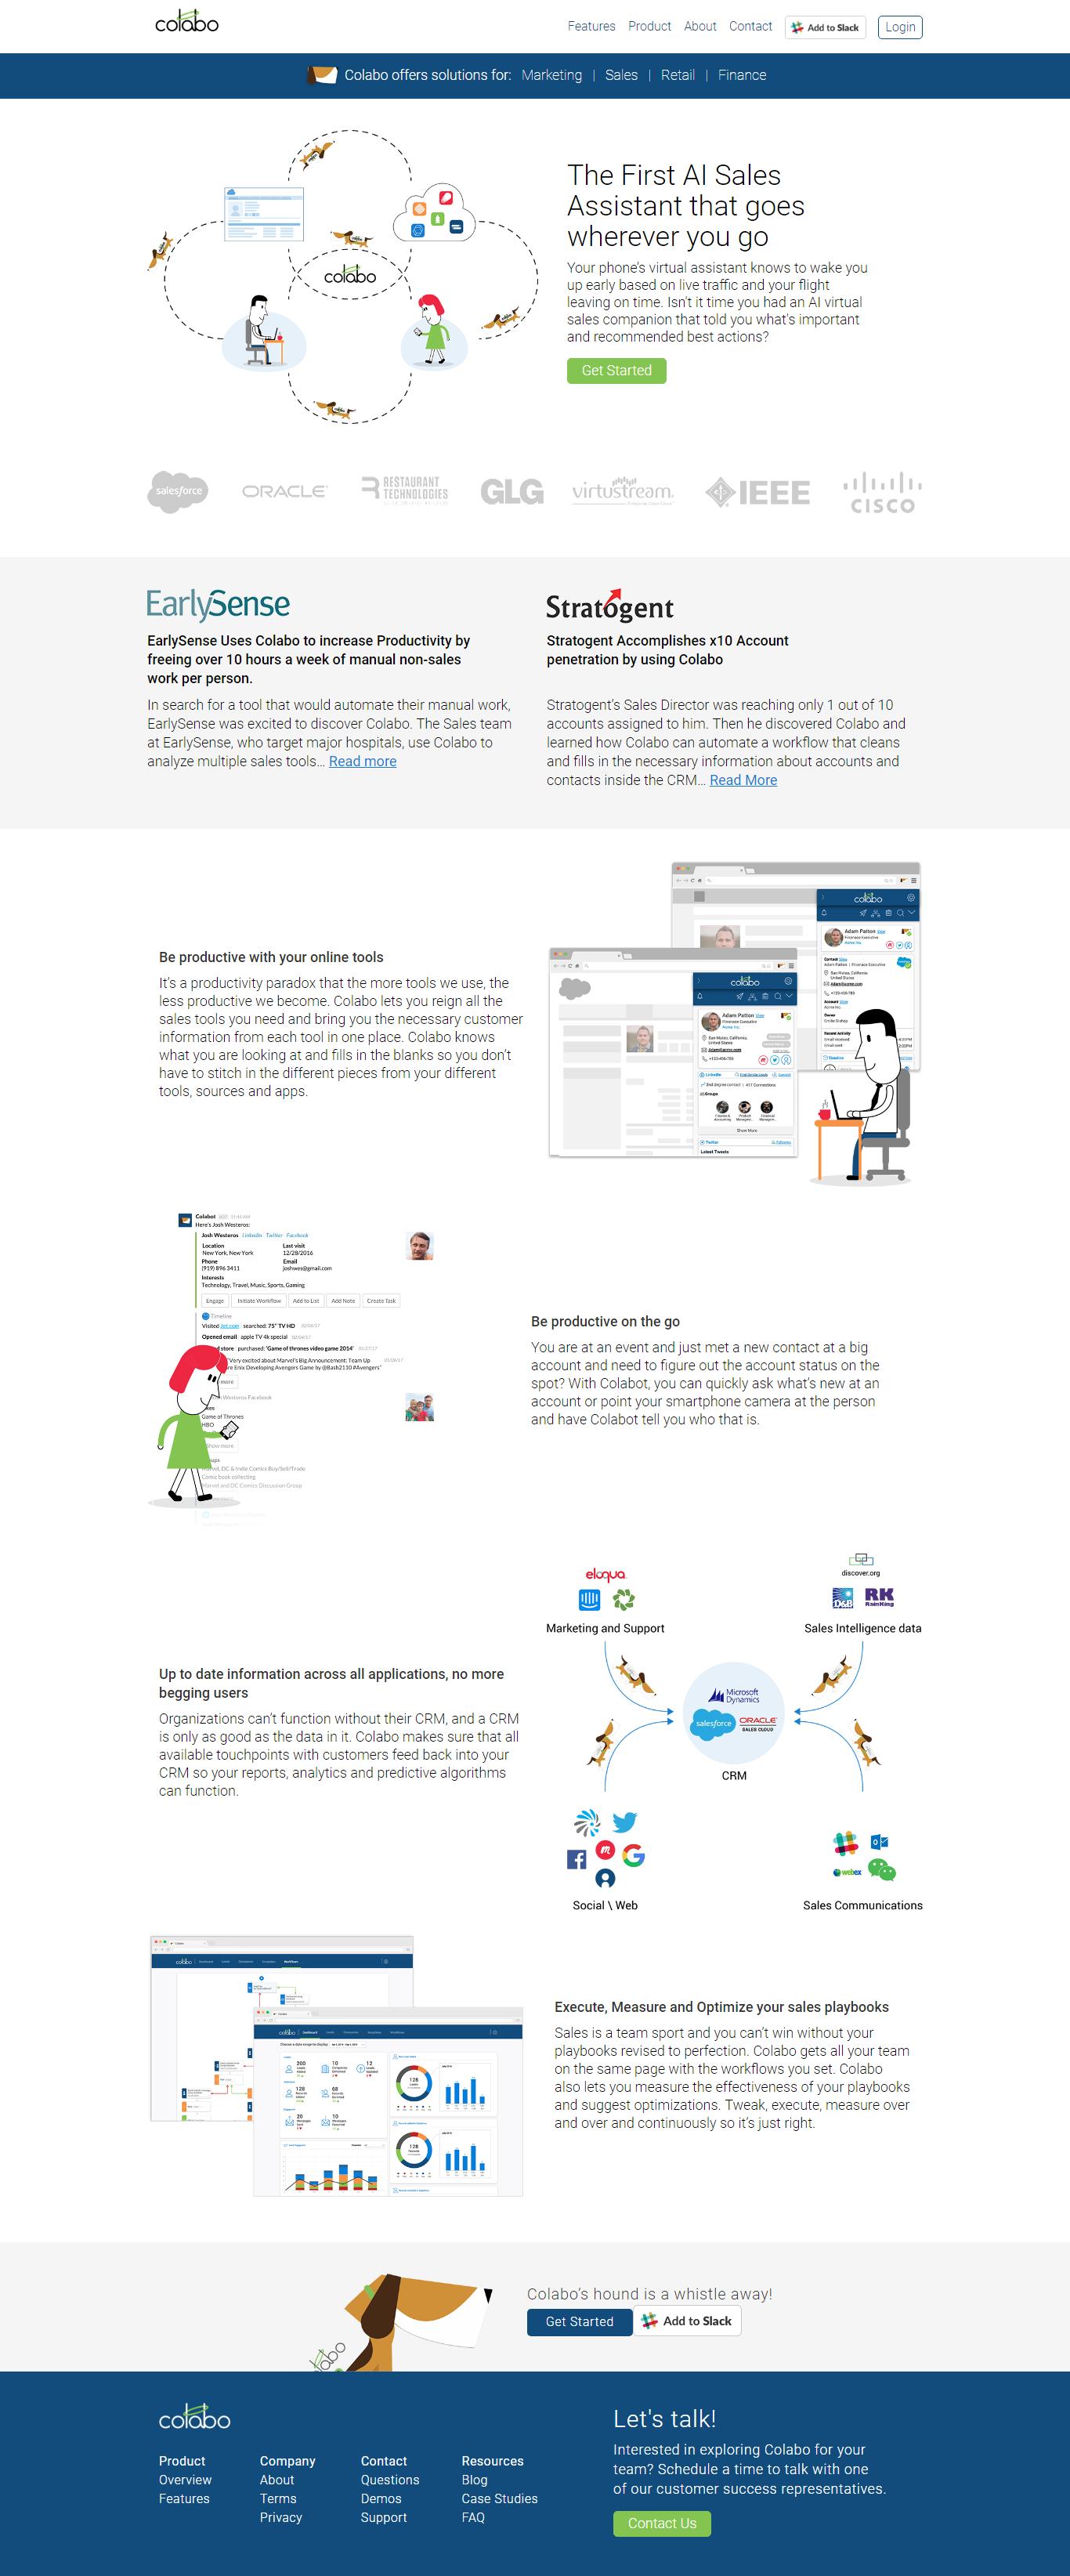 Codeigniter Portfolio by STPL Inc 586718 - Freelancer on Guru